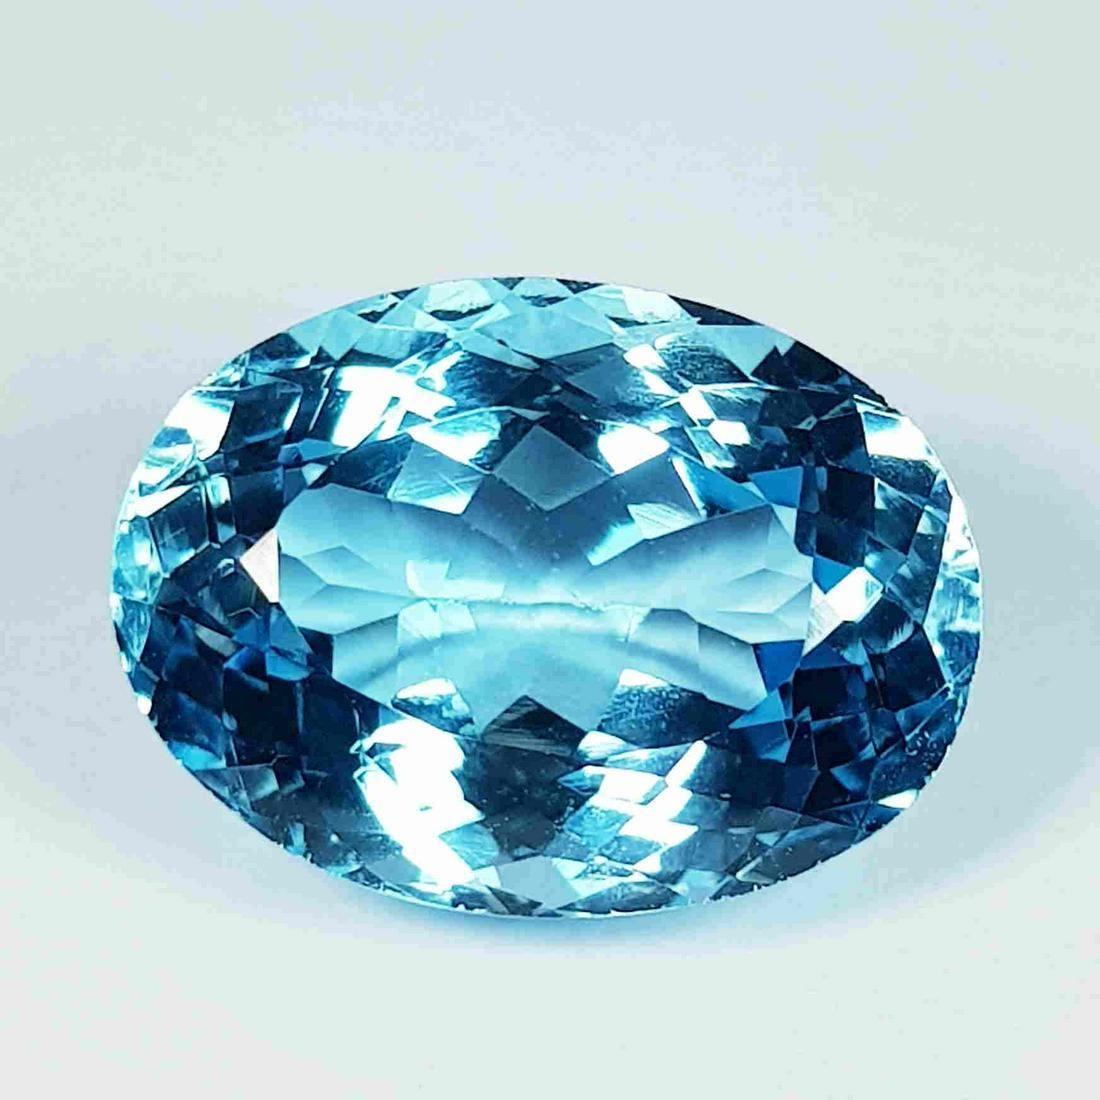 12.90 Ct Exclusive Gem Oval Cut Natural Blue Topaz